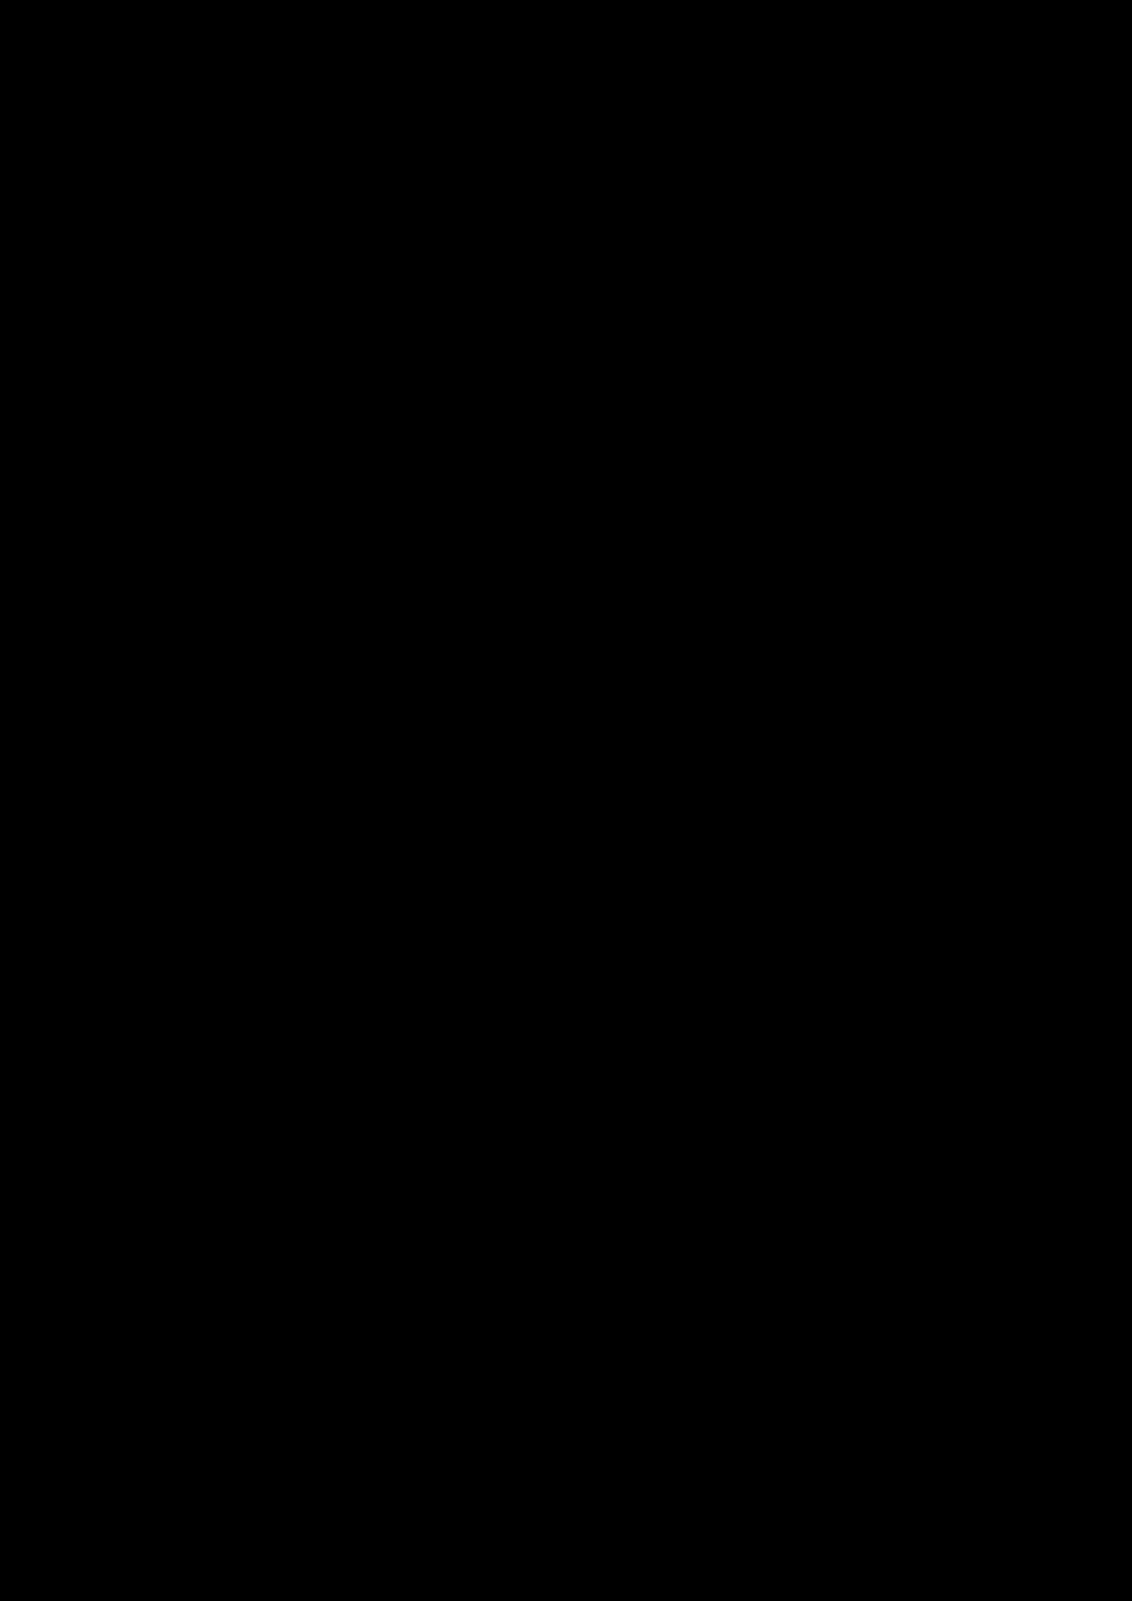 Prosti slide, Image 27